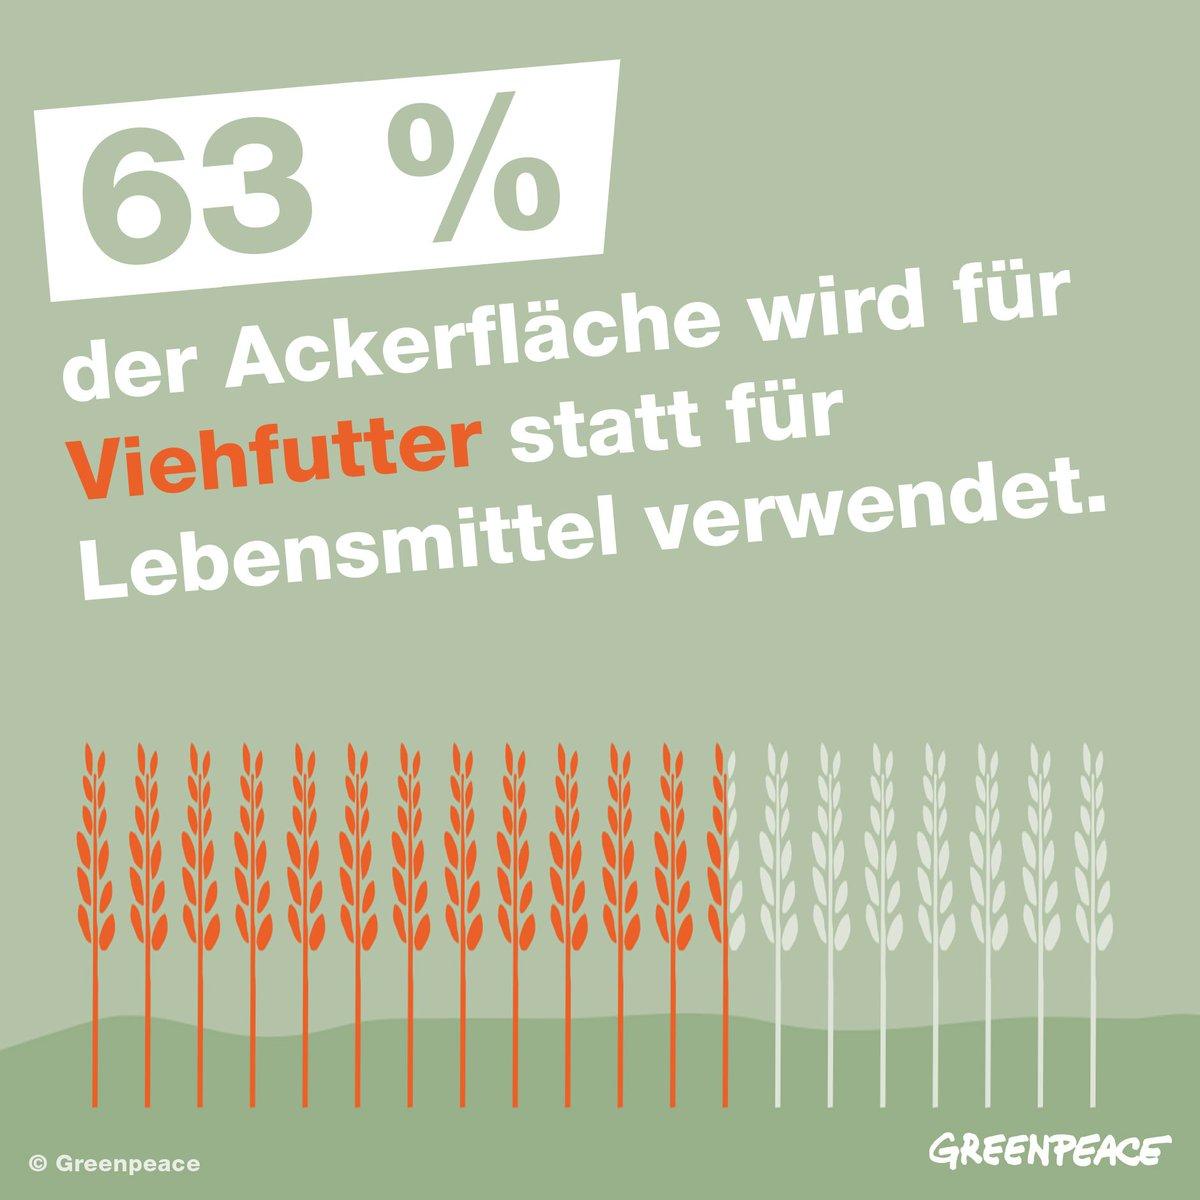 Greenpeace e.V.'s photo on landwirtschaft